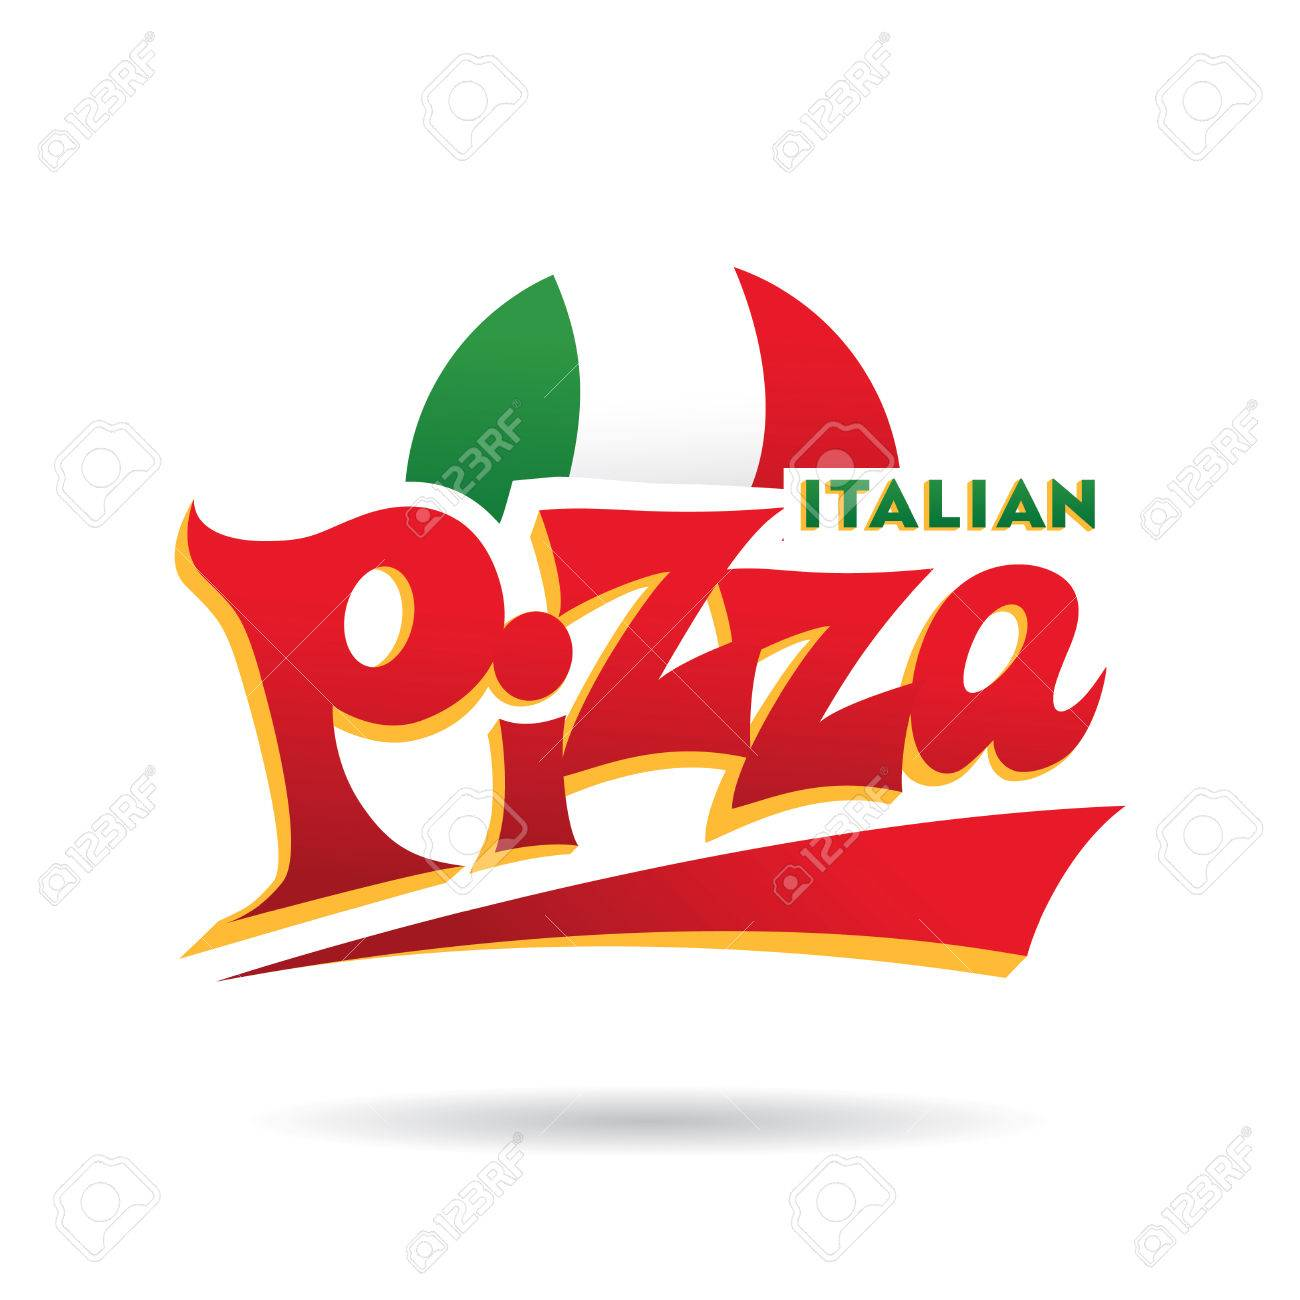 italian pizza logo rh 123rf com pizza logo maker pizza logo quiz